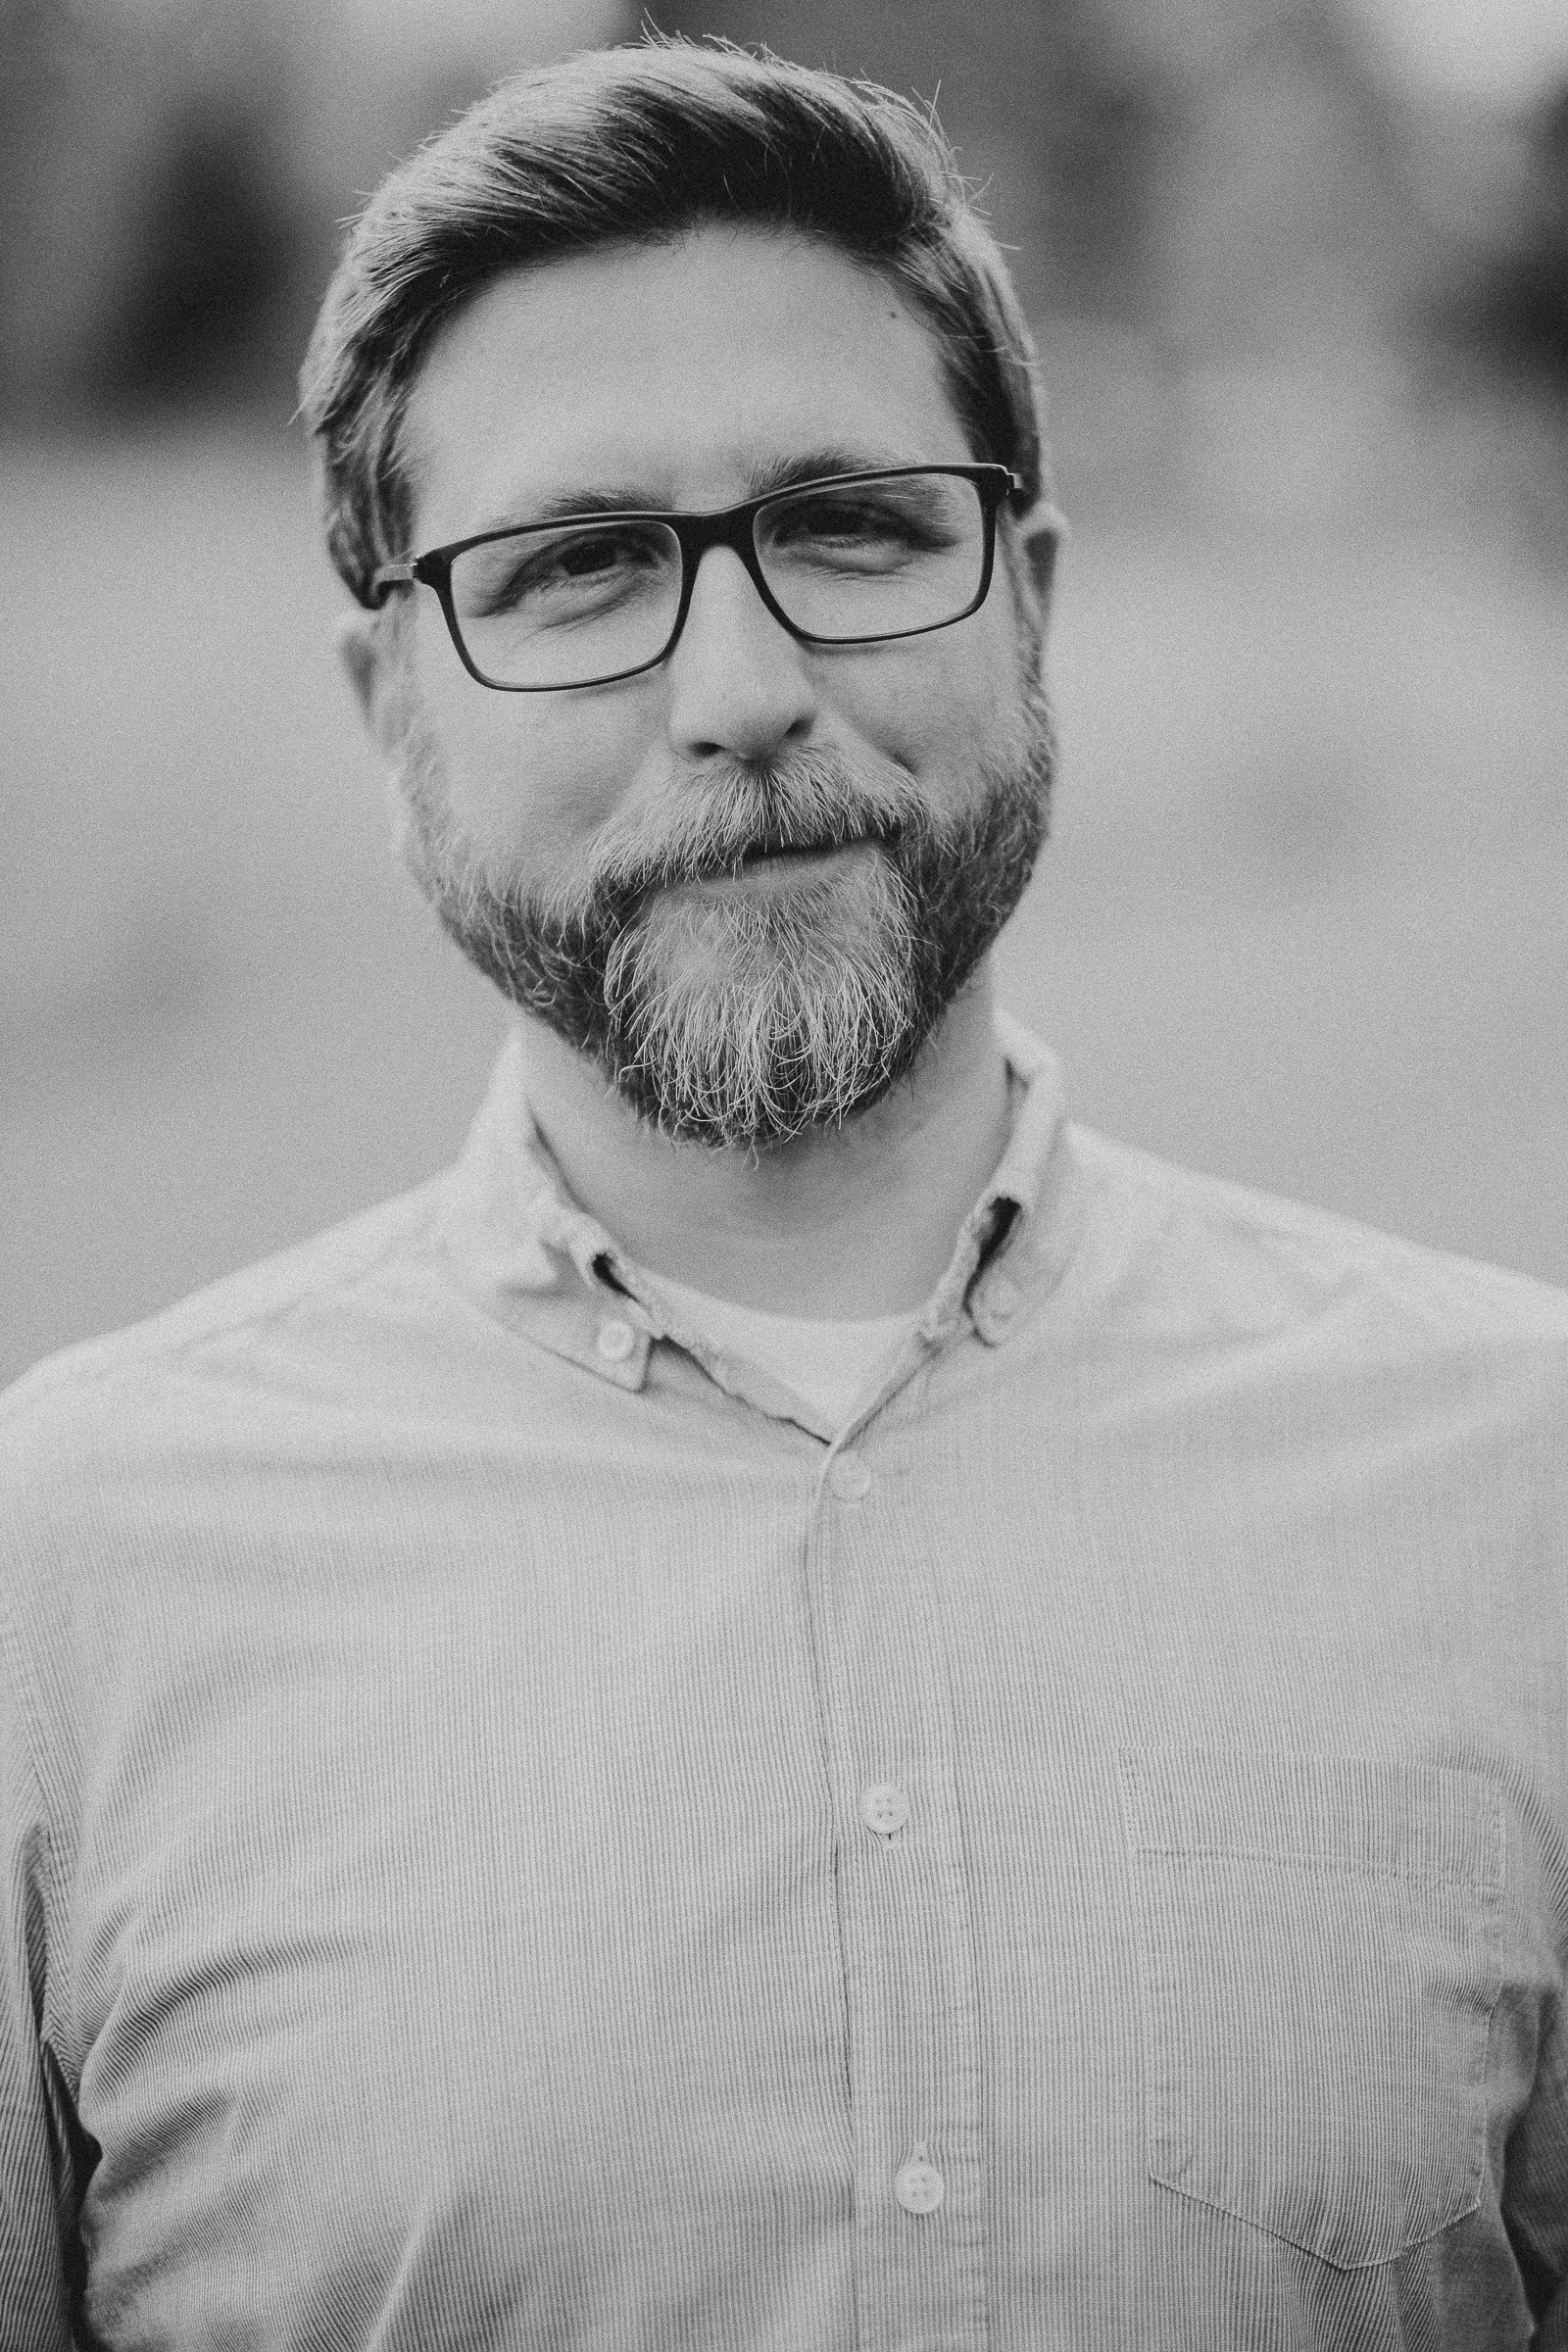 Seattle Headshots Portrait - Justin Clark Photography - City Urban-7084.jpg